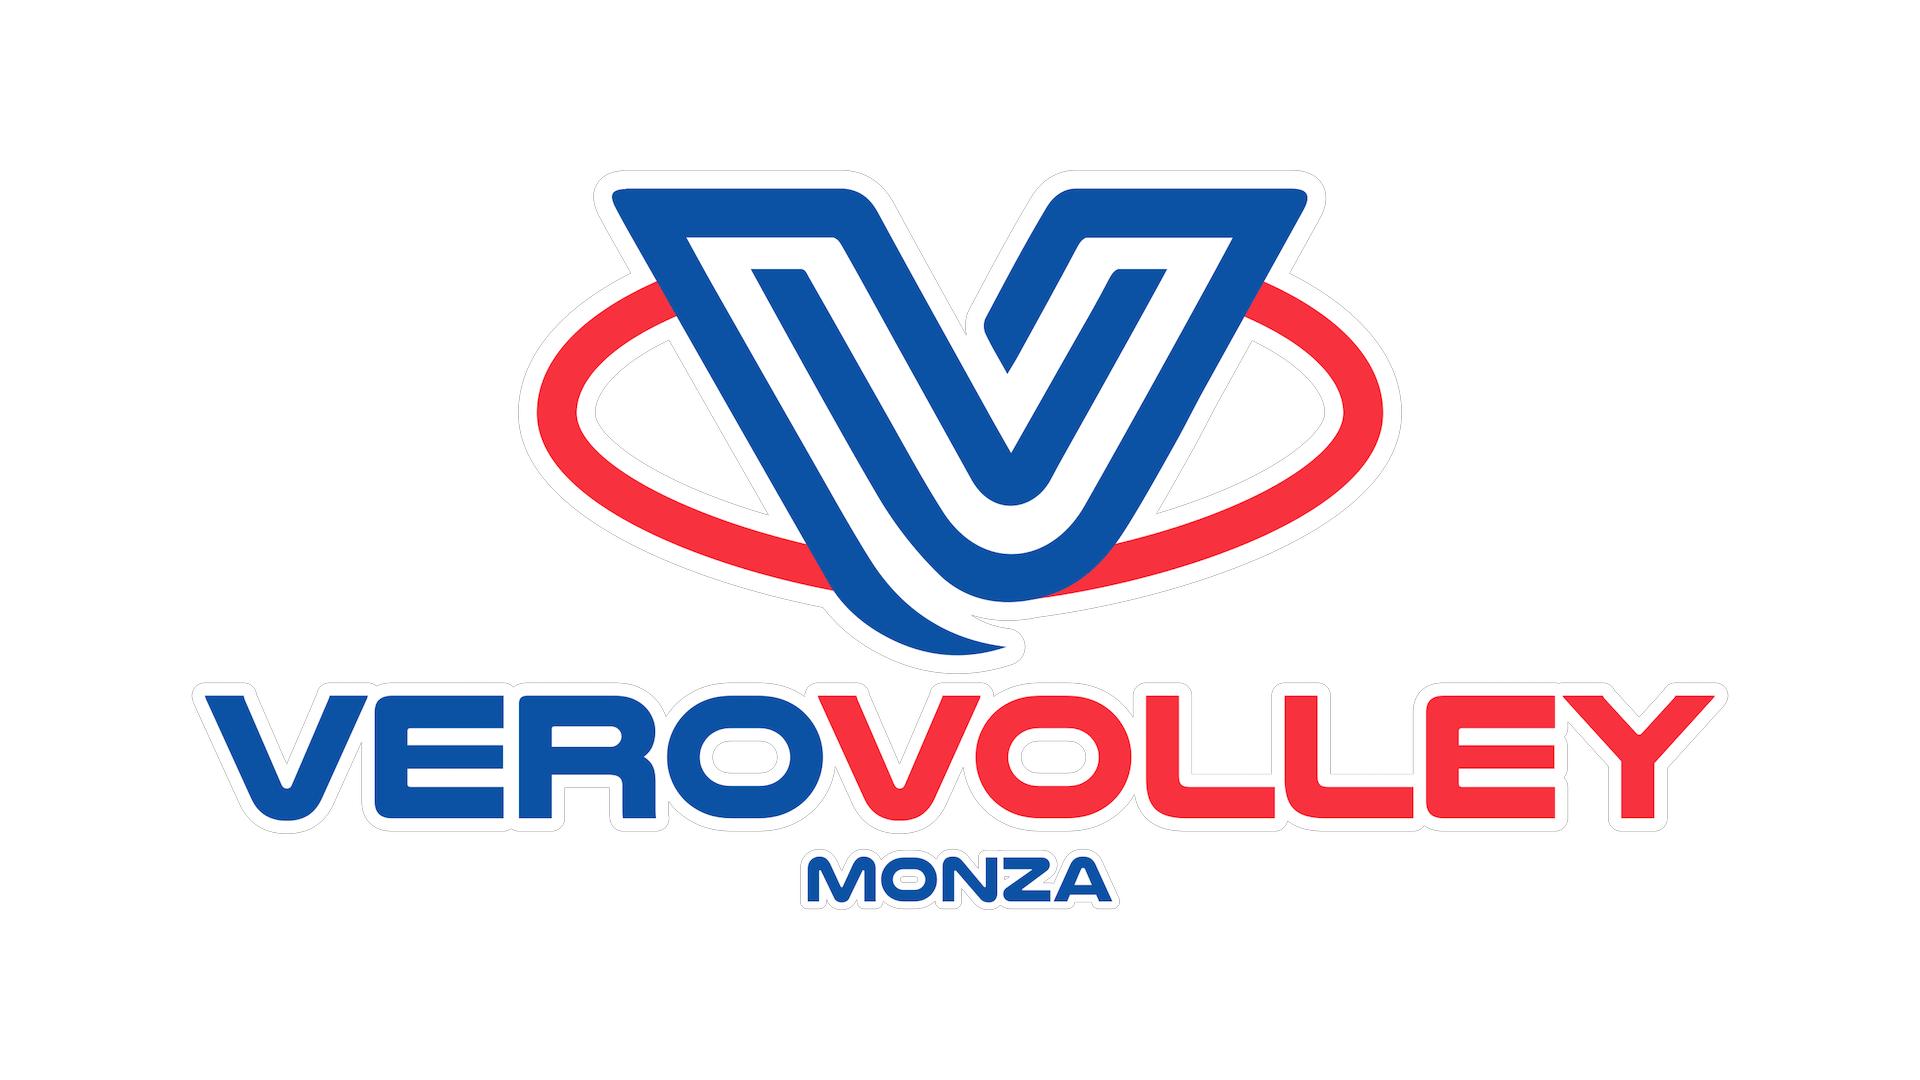 VeroVolley-monza_logo